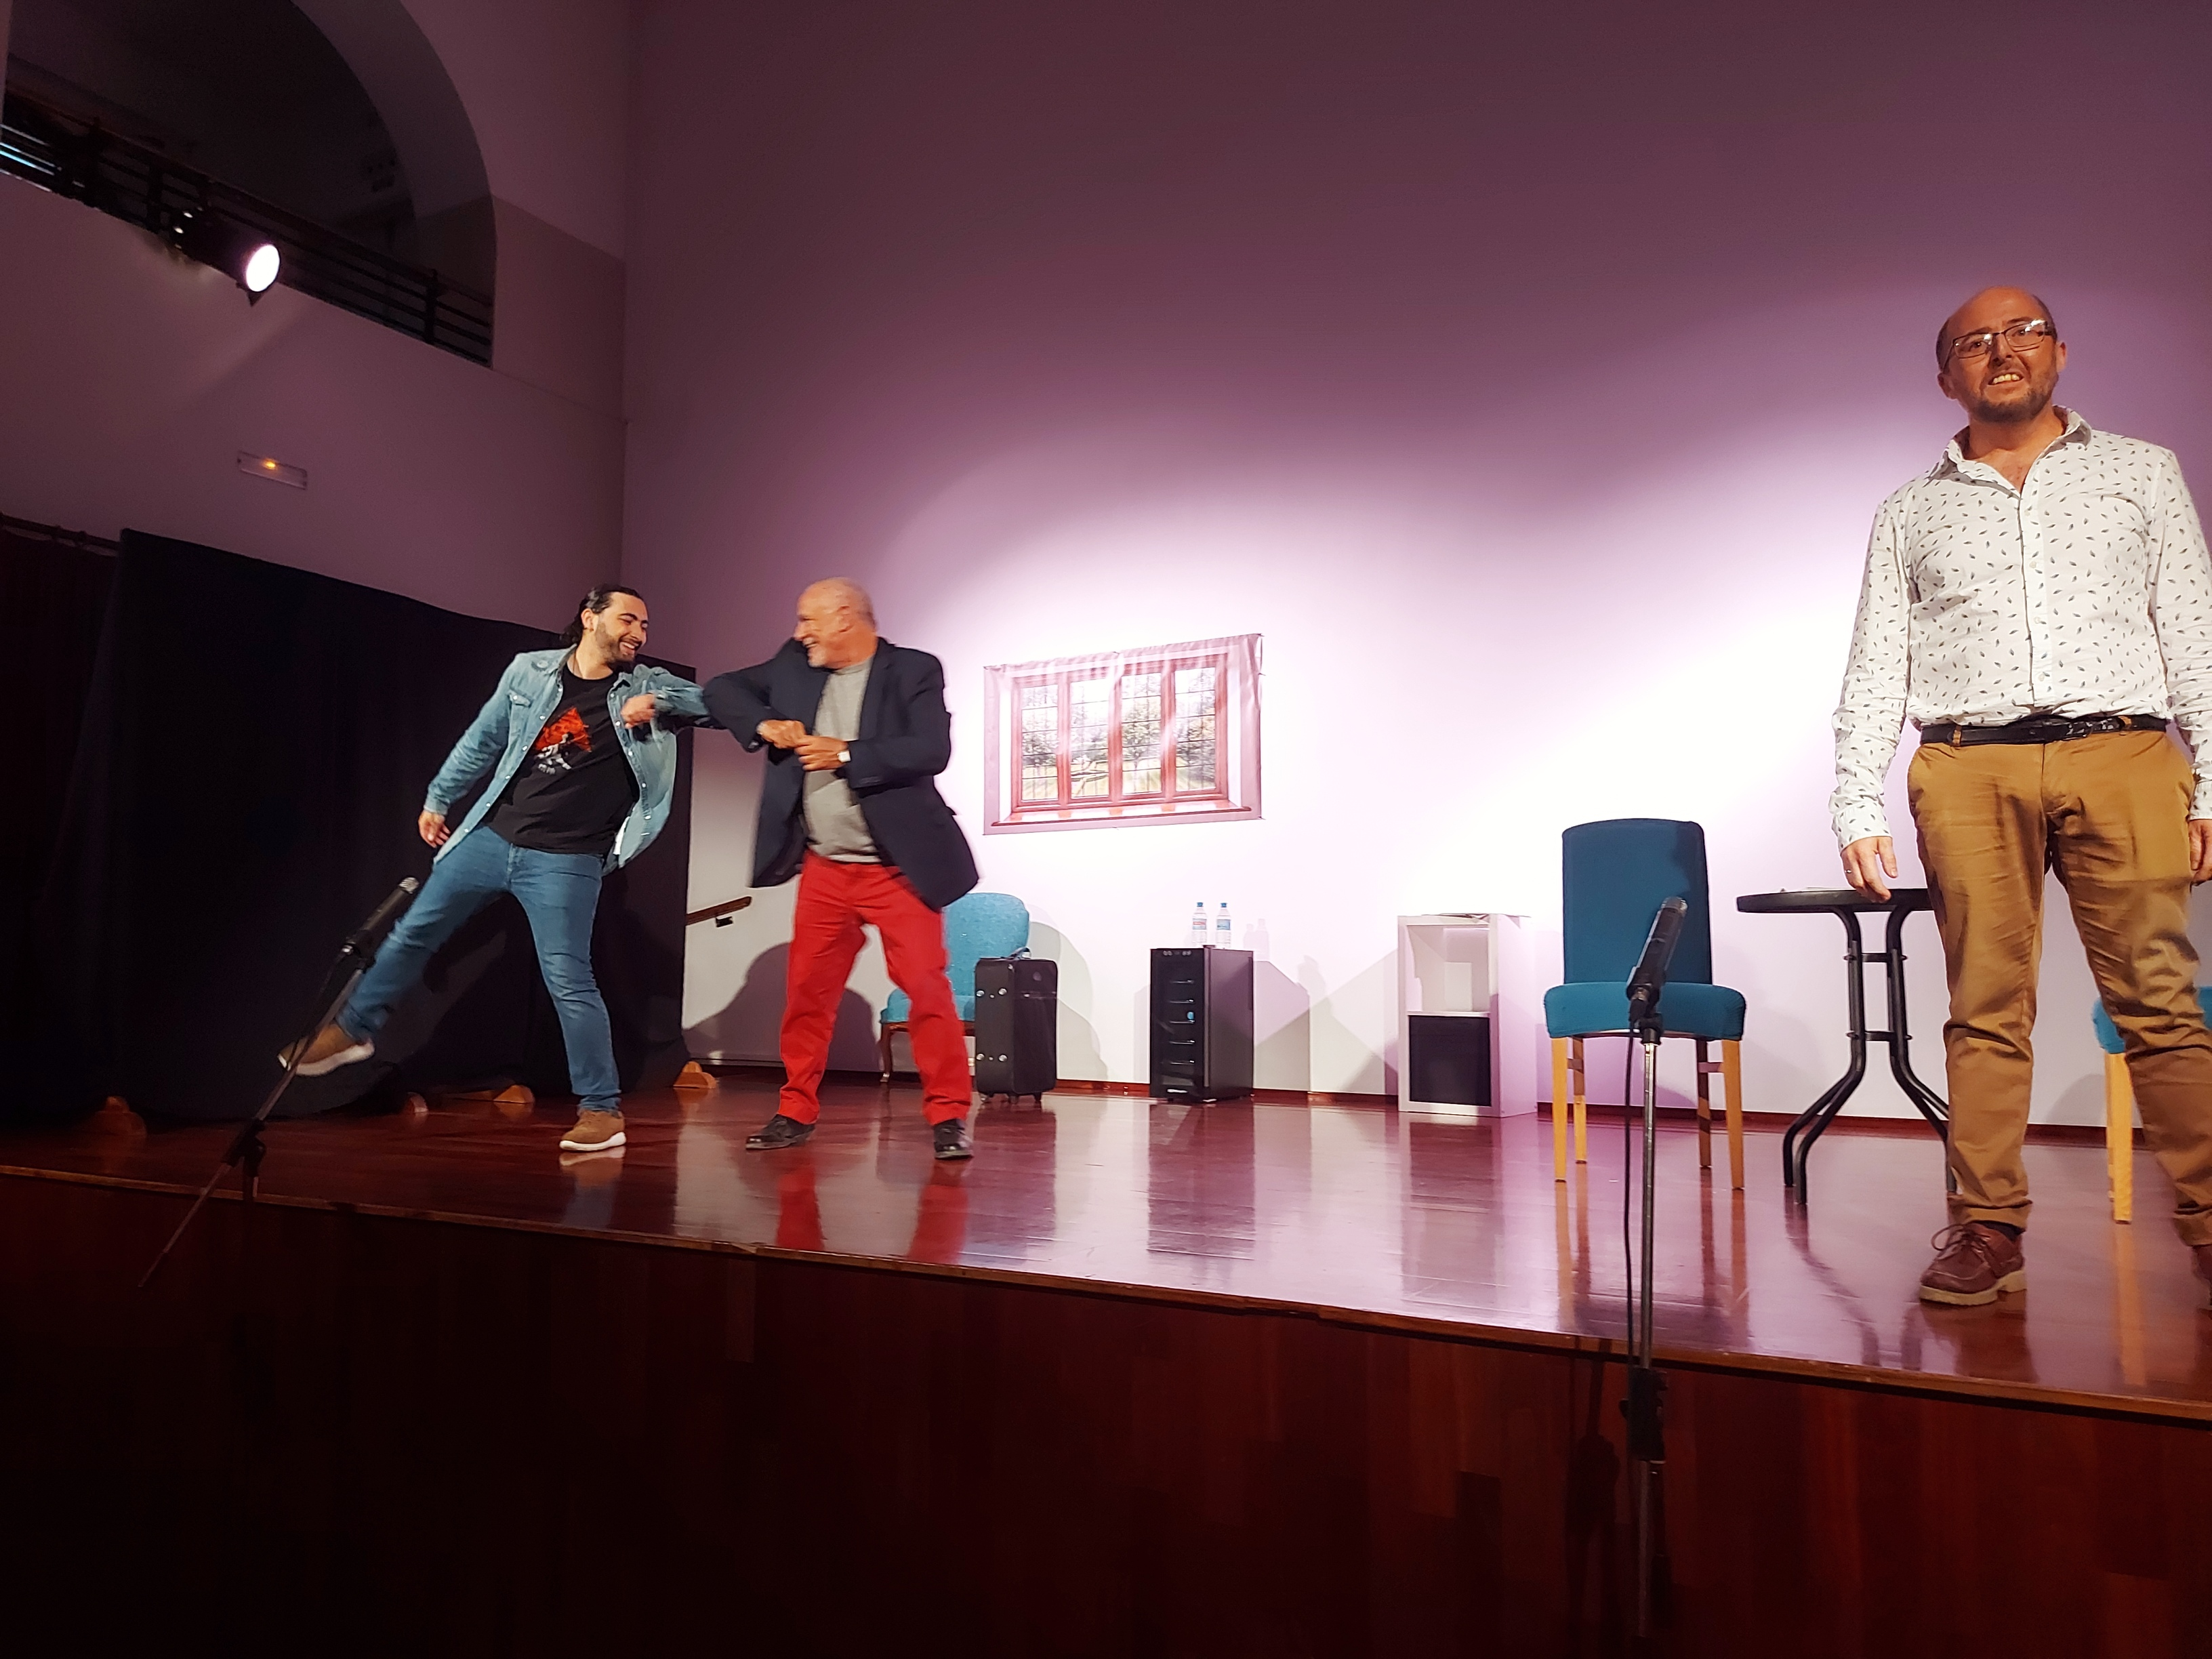 20210422190632_happened_61_teatro-laberinto-de-crisol-teatro-19.jpg